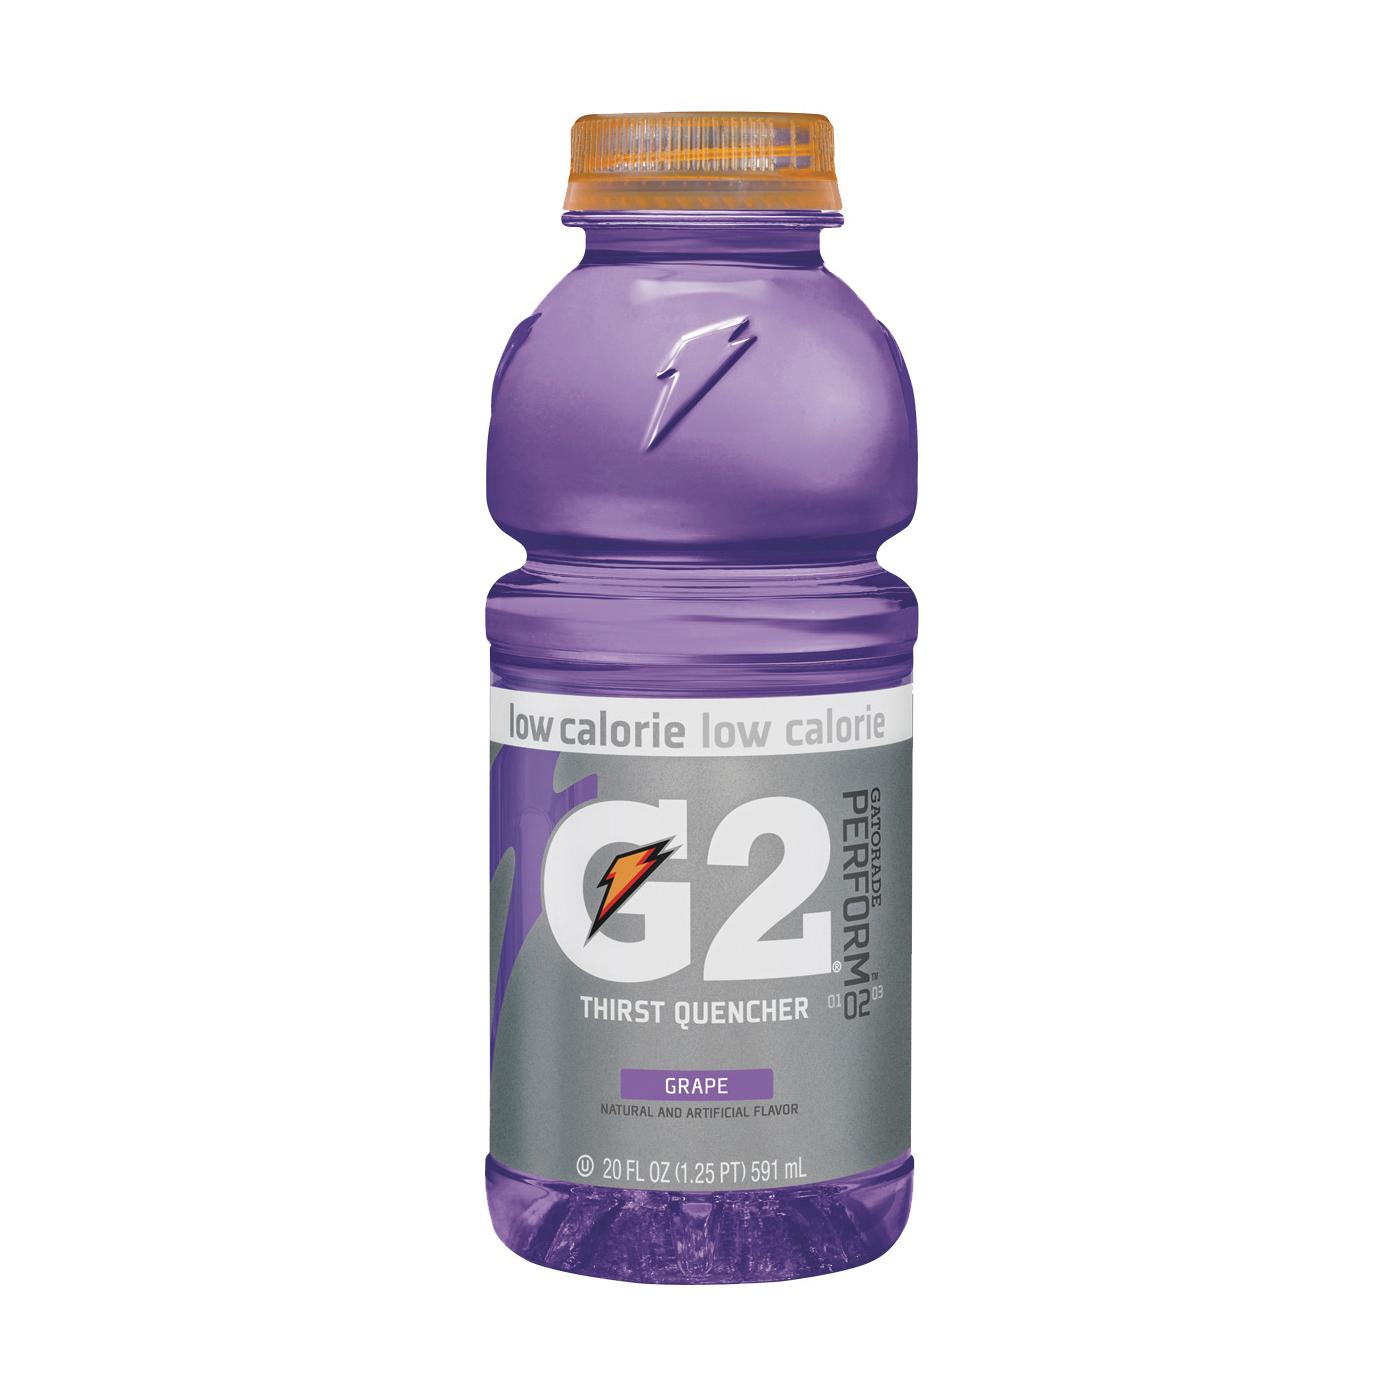 Picture of Gatorade G2 20406 Thirst Quencher Sports Drink, Liquid, Grape Flavor, 20 oz Package, Bottle